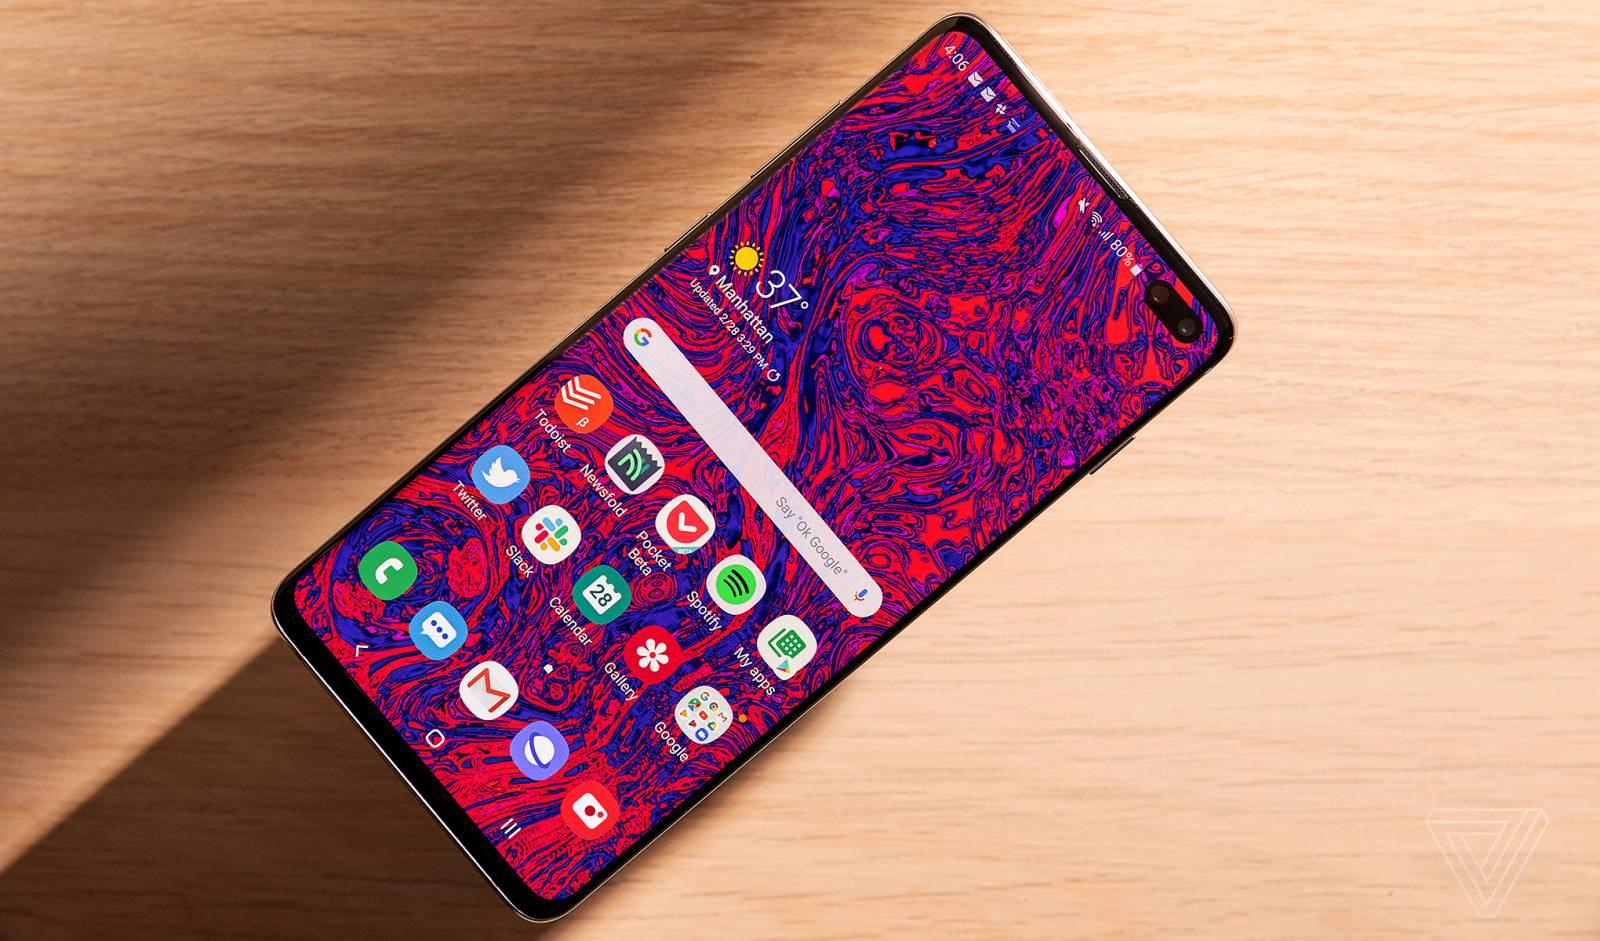 eMAG Pret REDUS Samsung GALAXY S10 1400 lei